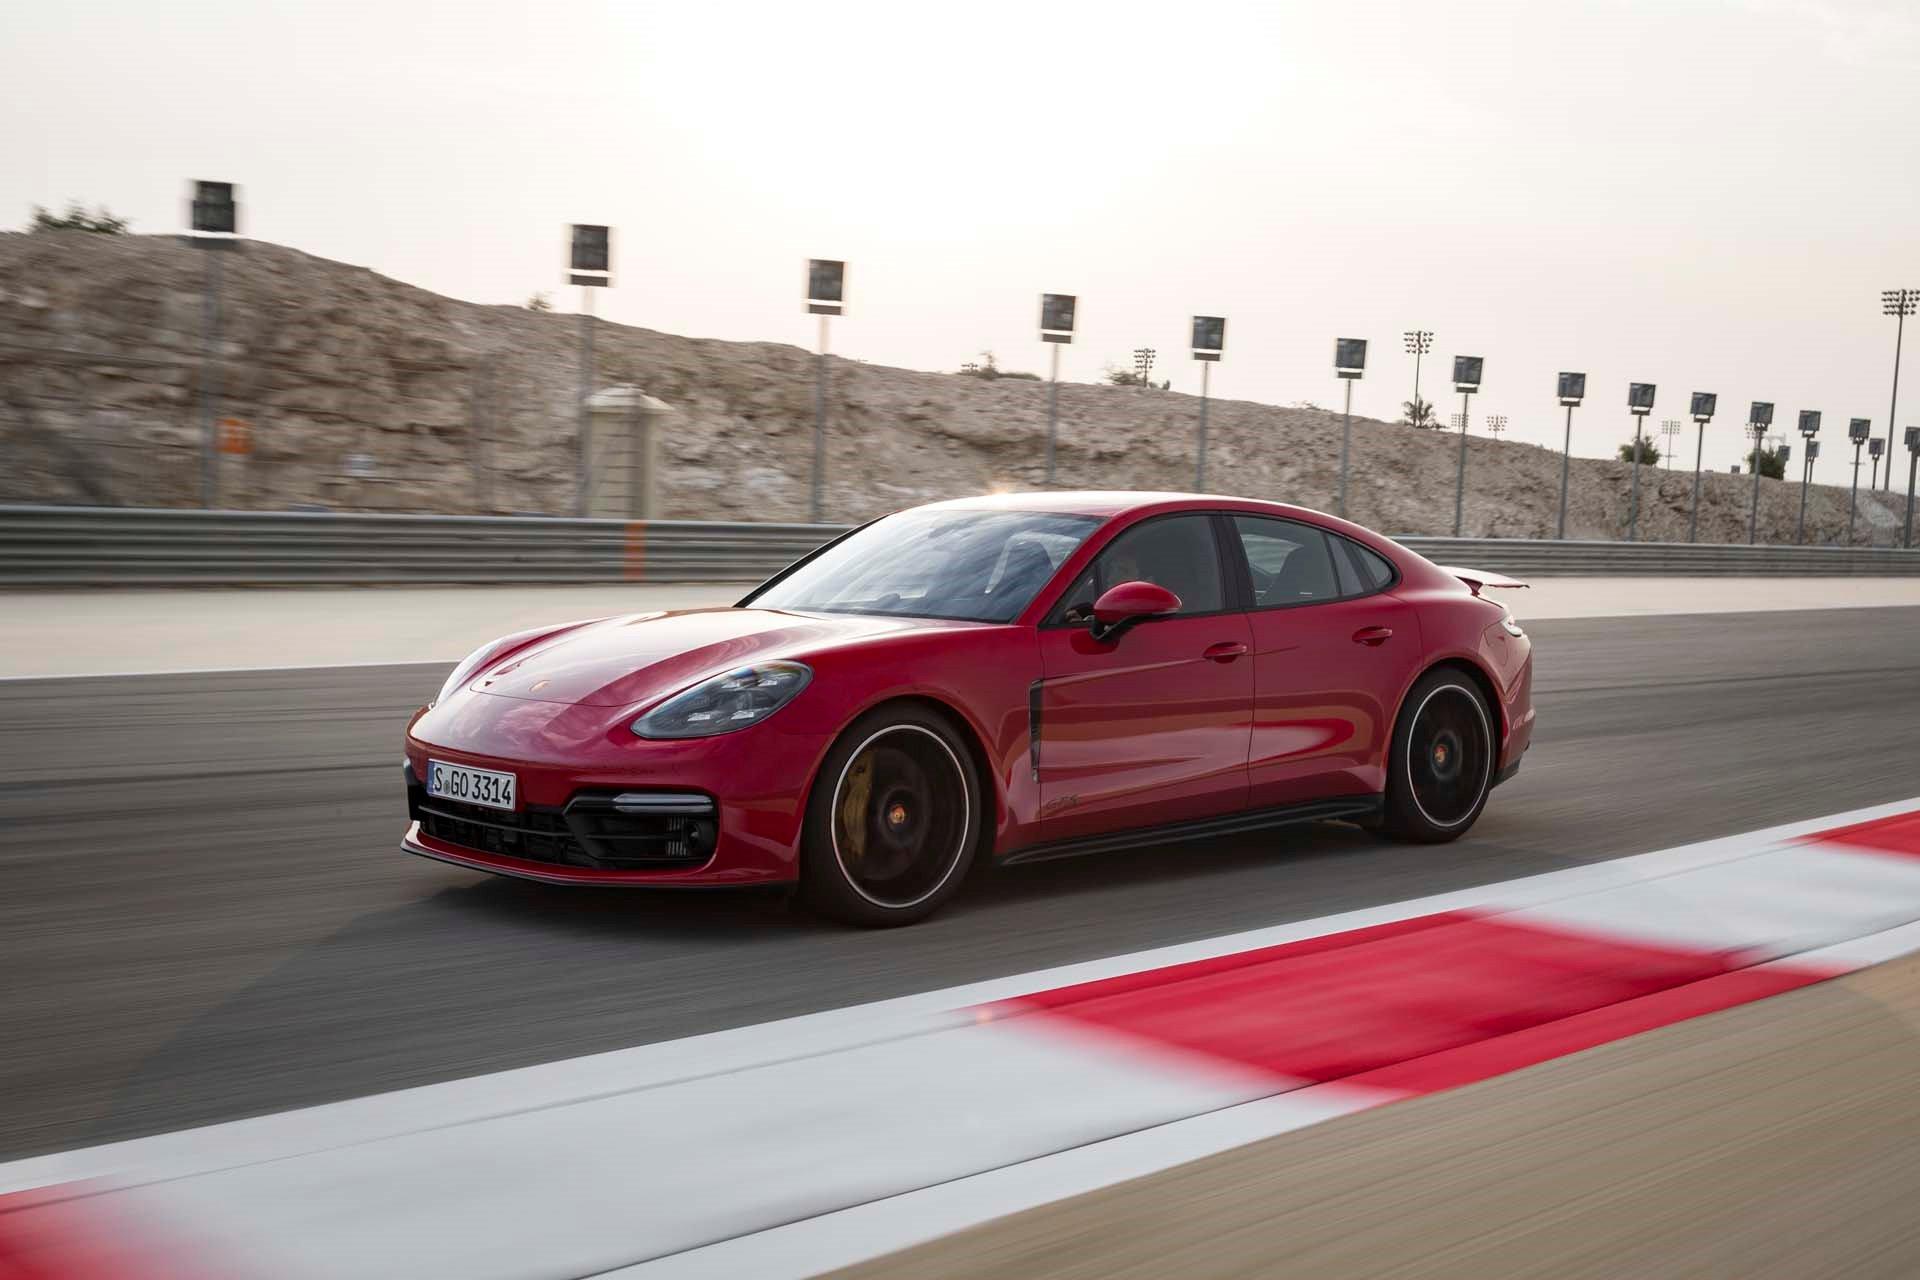 New 2019 Porsche- Panamera Turbo S E-Hybrid Panamera Turbo S E-Hybrid for sale $186,200 at M and V Leasing in Brooklyn NY 11223 1